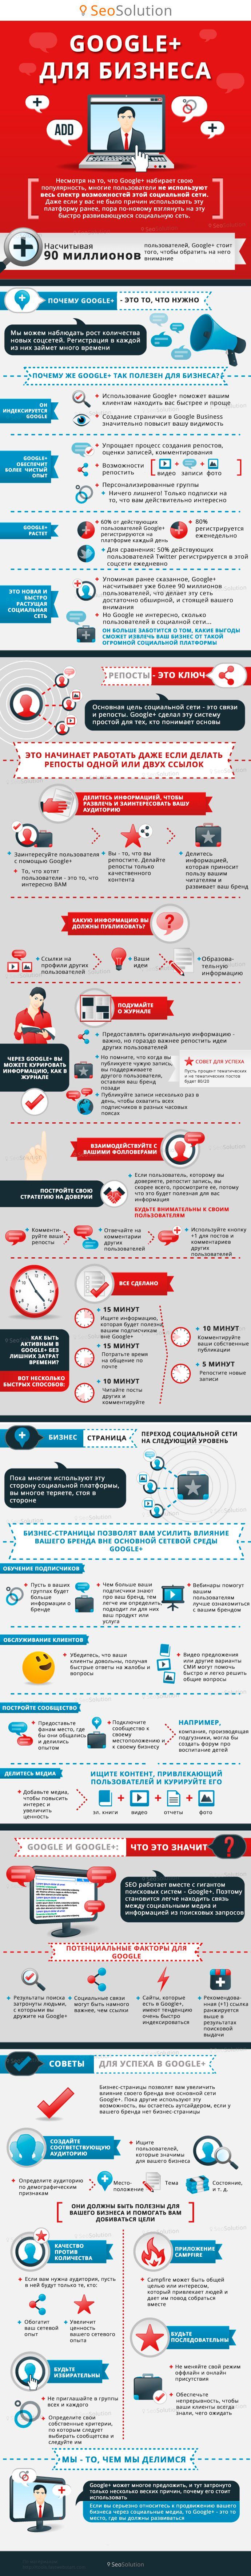 Инфографика: продвигаем бренд в Google https://seosolution.ua/blog/infographics/google-for-business-infographics.html #SeoSolution #seo #smm #blog #marketing #web #it #kharkov #сео #смм #продвижение #бизнес #реклама #сайт #харьков #оптимизация